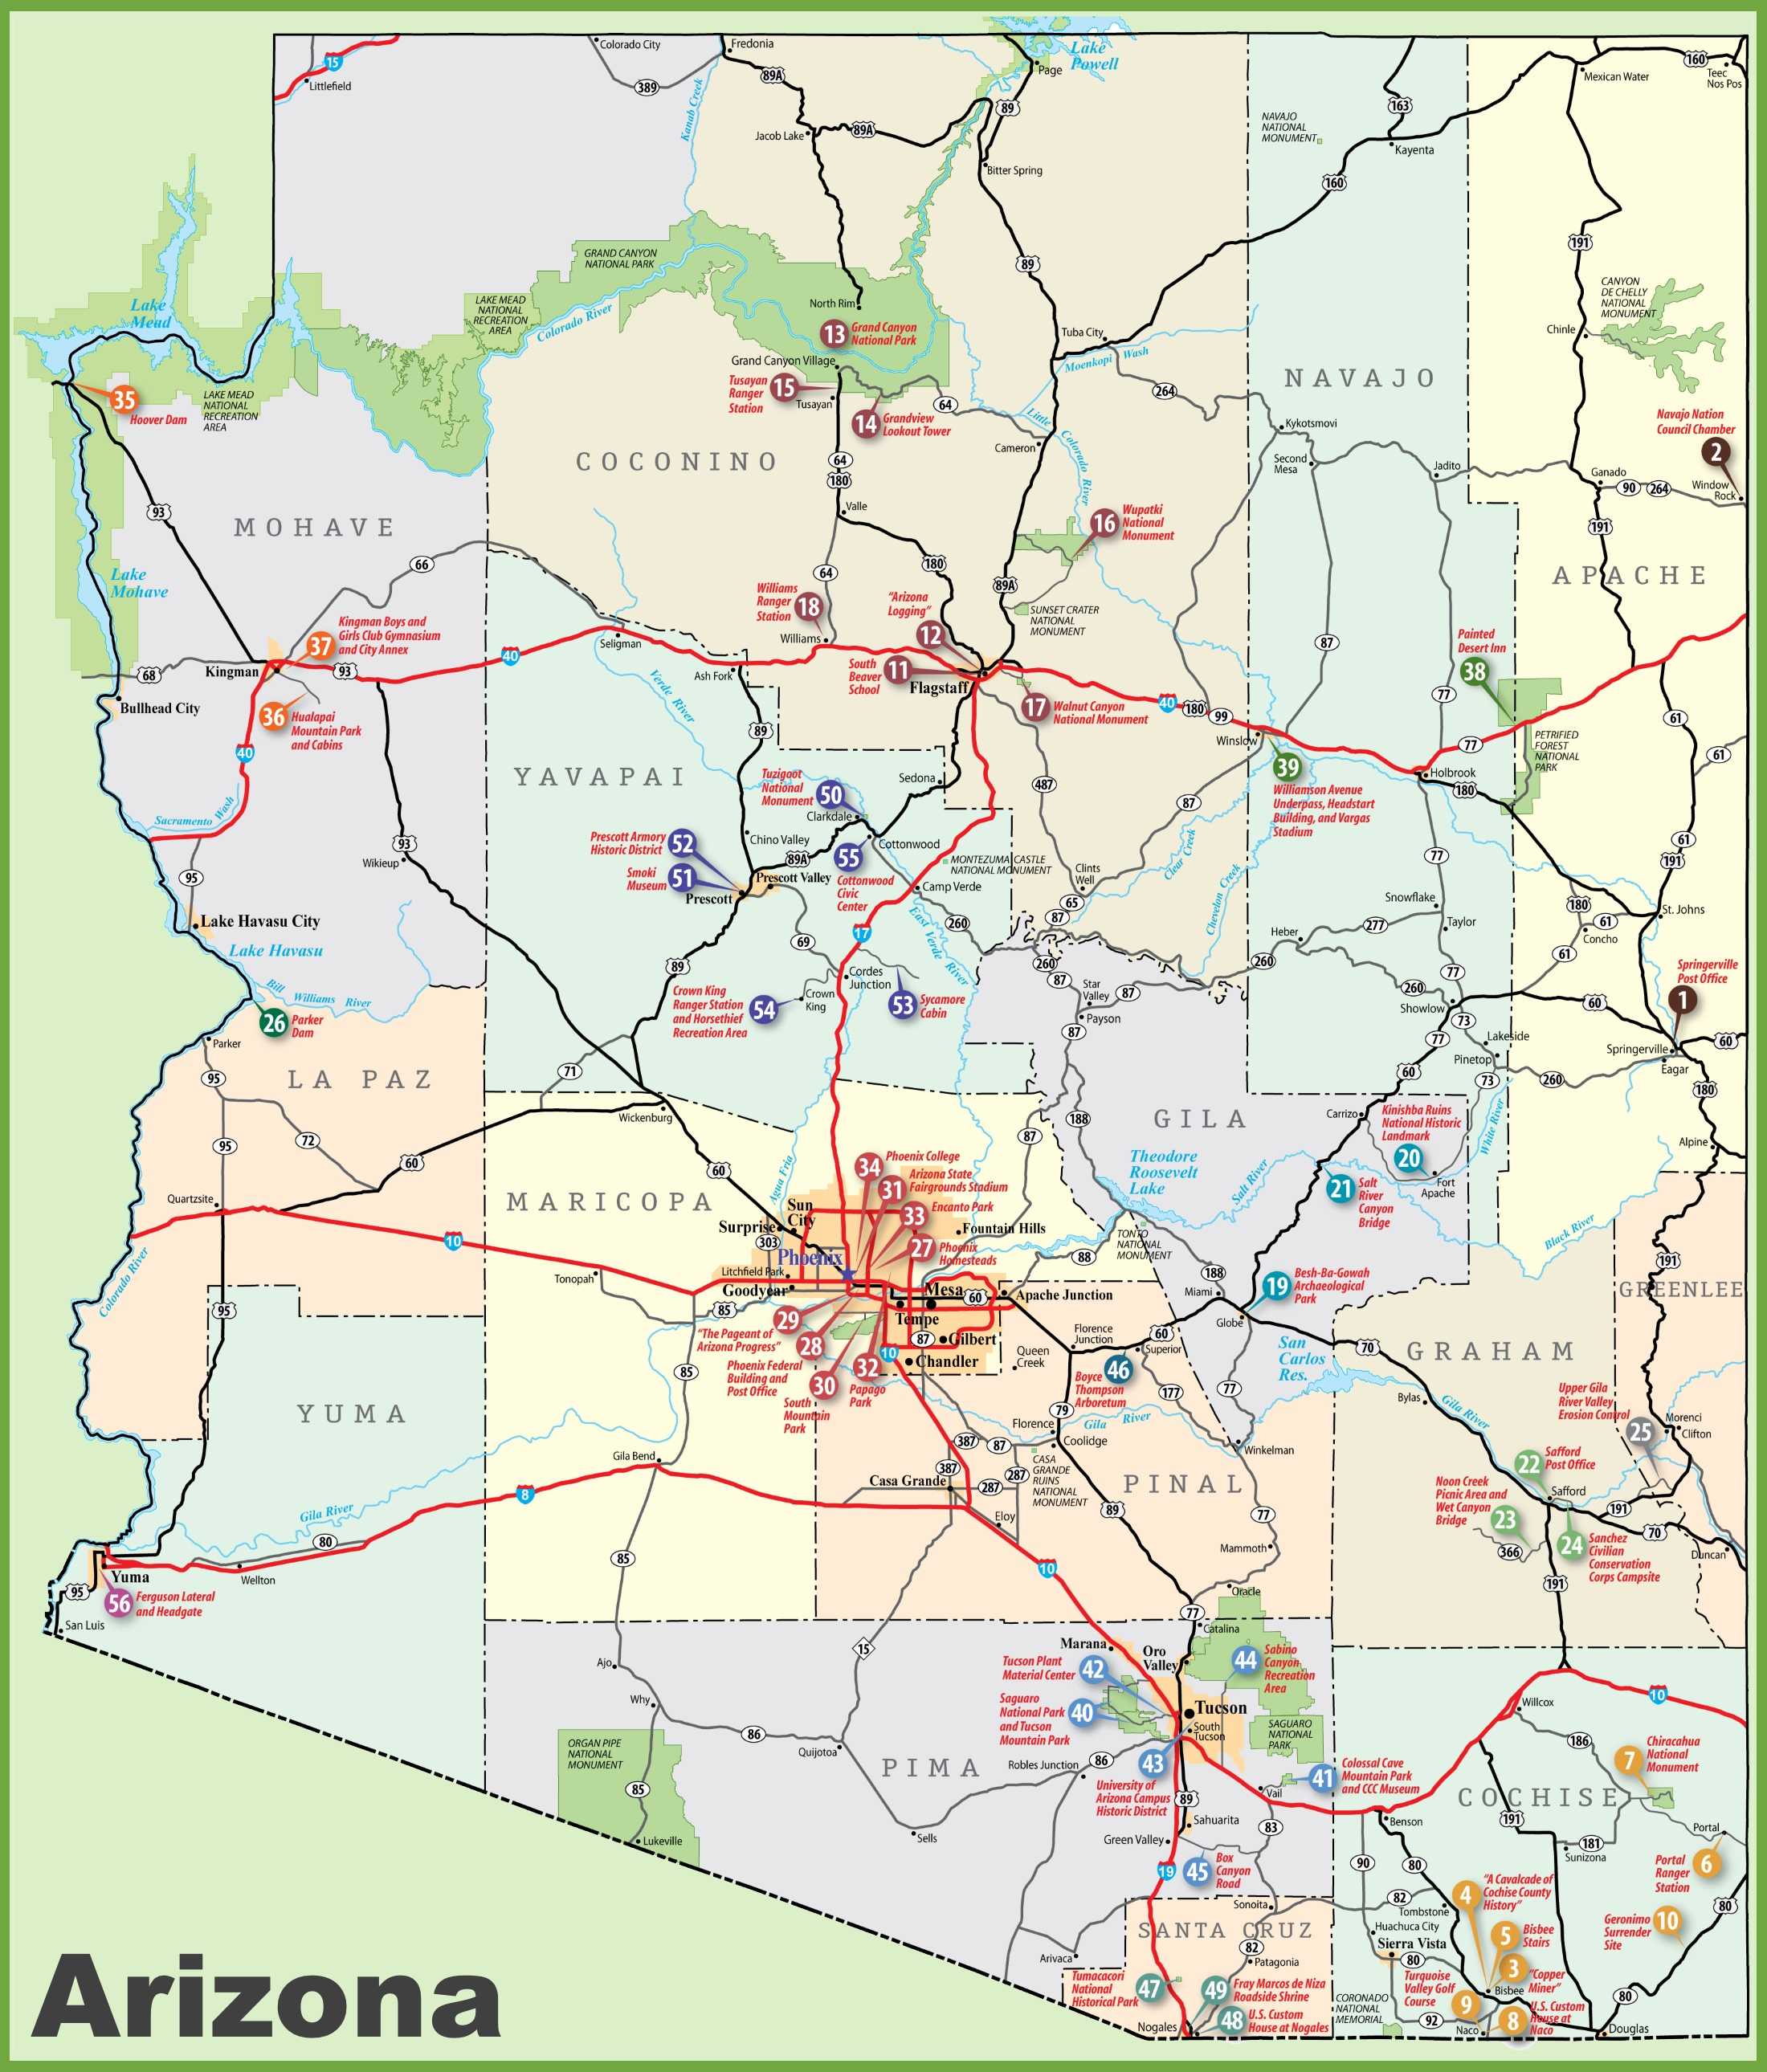 Arizona Landmarks Map Arizona sightseeing map